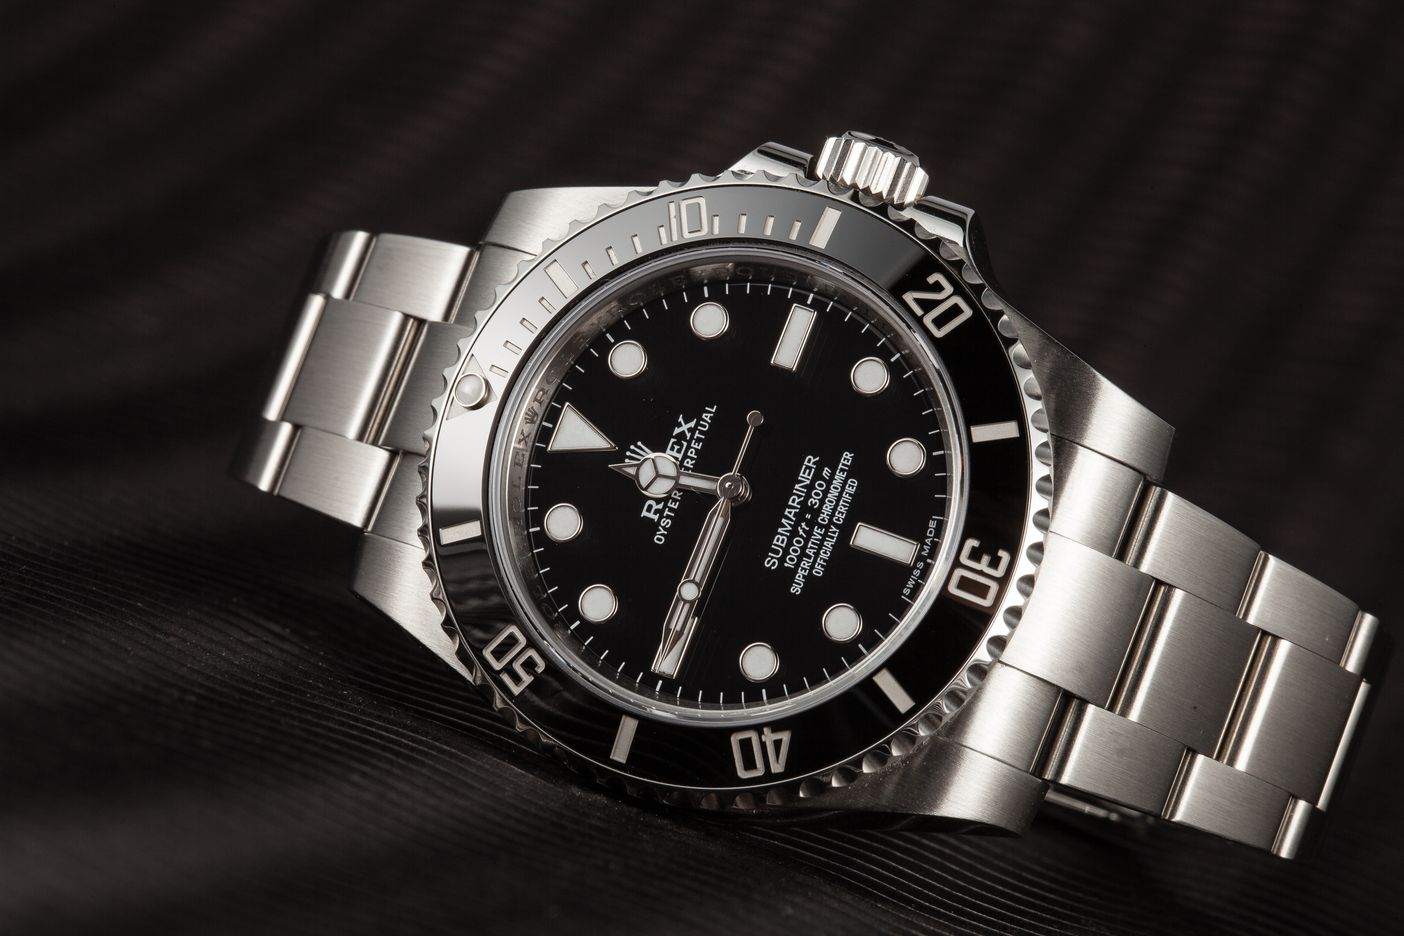 Iconic Rolex